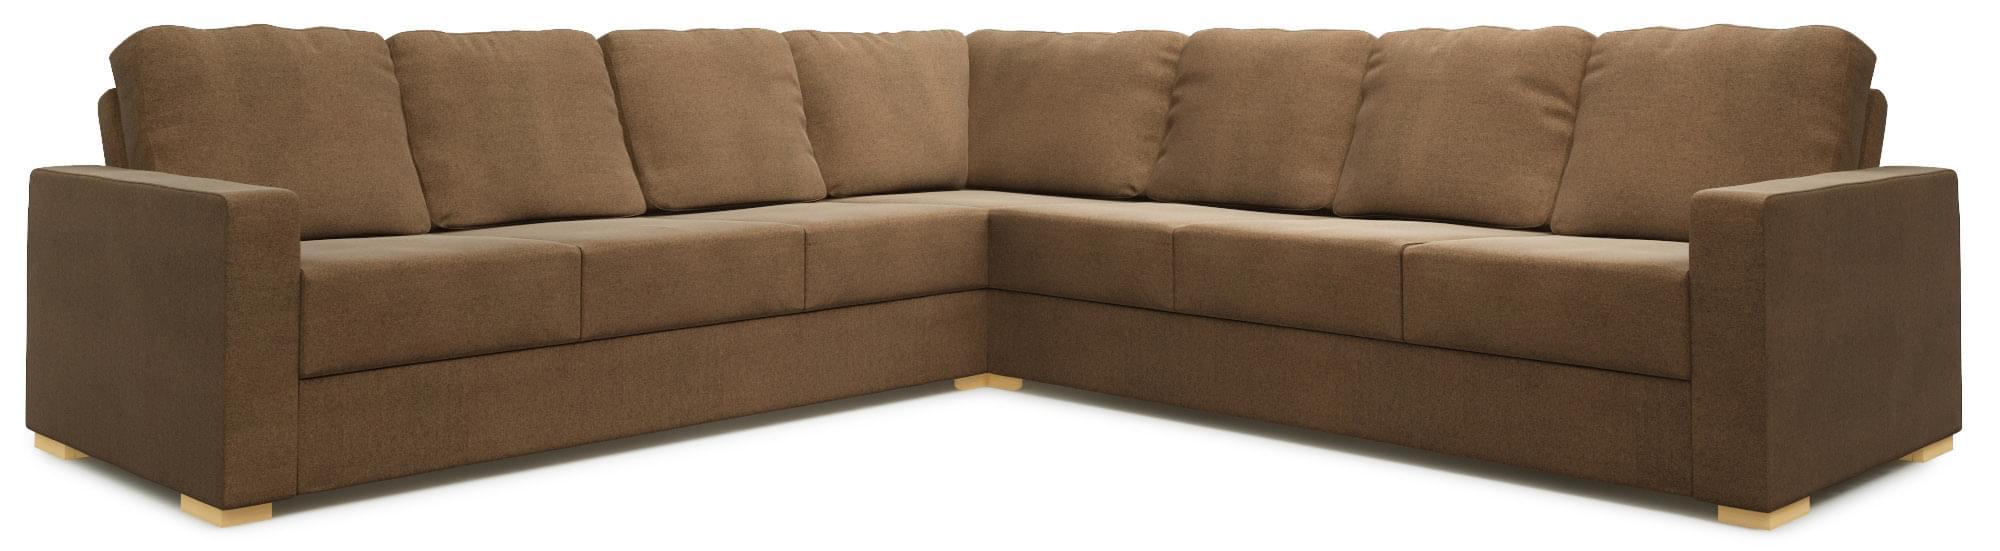 Lear 4X4 Corner Sofa